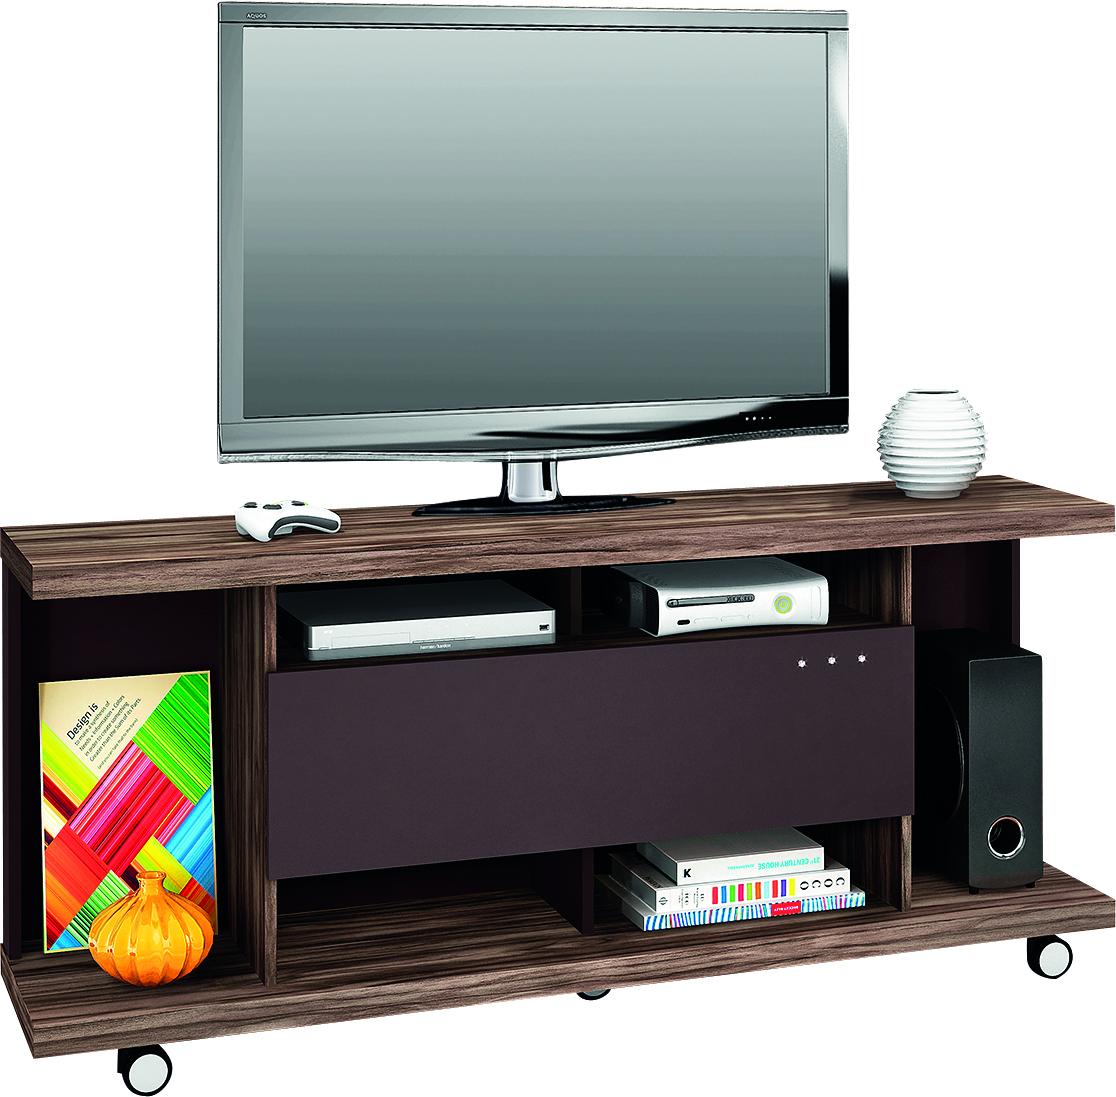 Mueble Para Tv Pantalla Equipo De Sonido Vitta Cod 5585 Labnash # Muebles Equipo De Sonido